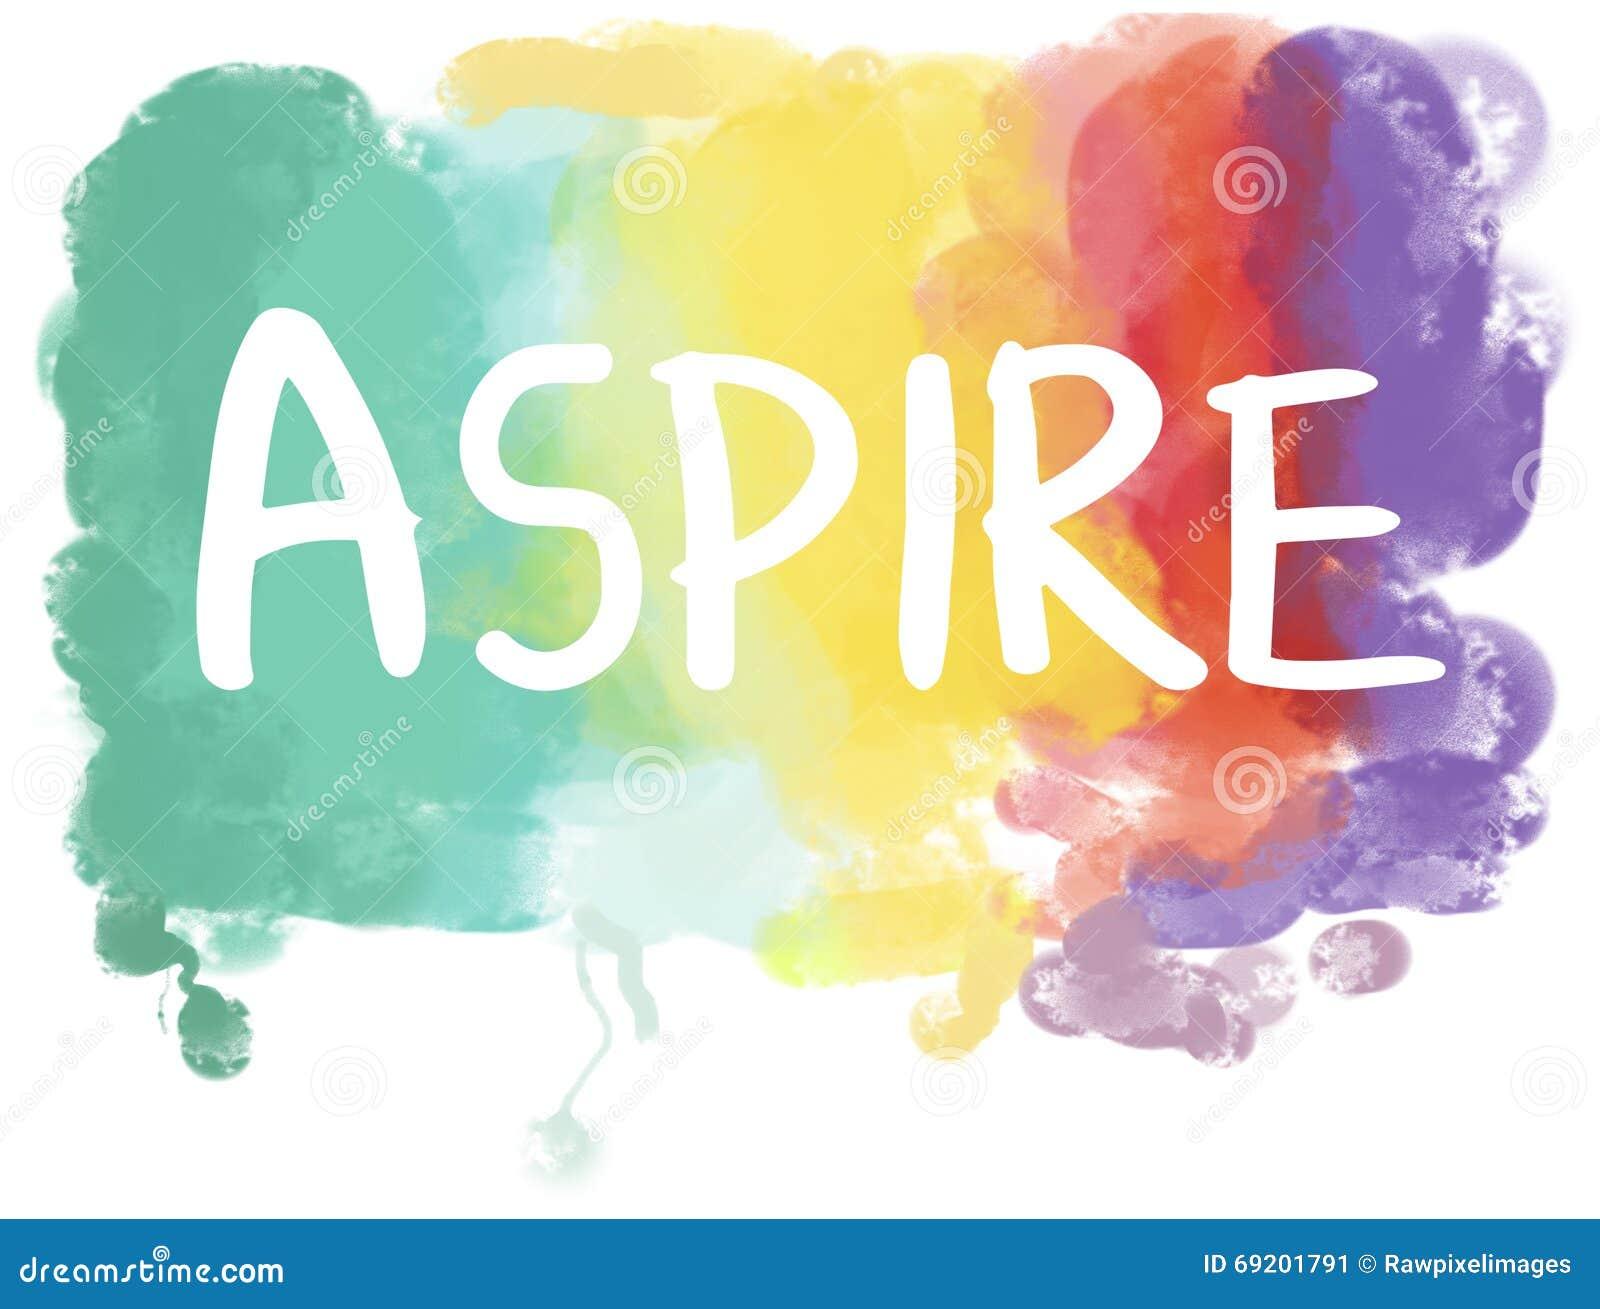 Aspirations Desire Dream Ambition Goals Concept